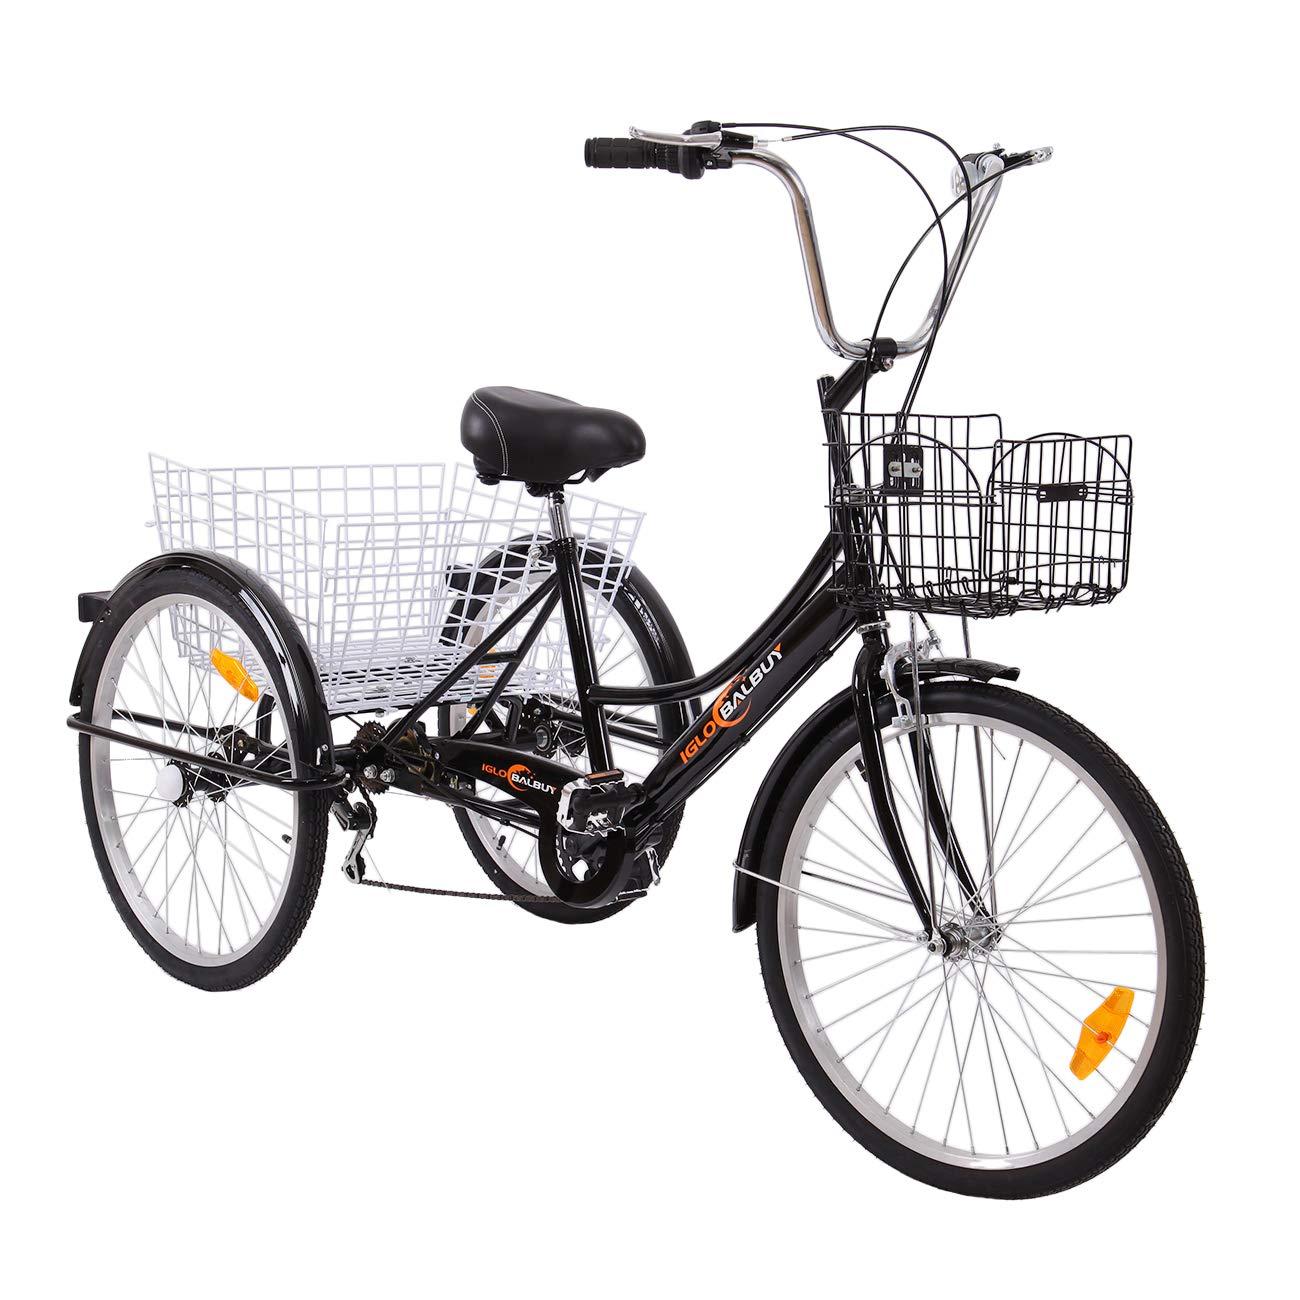 Yonntech Triciclo per Adulti 02